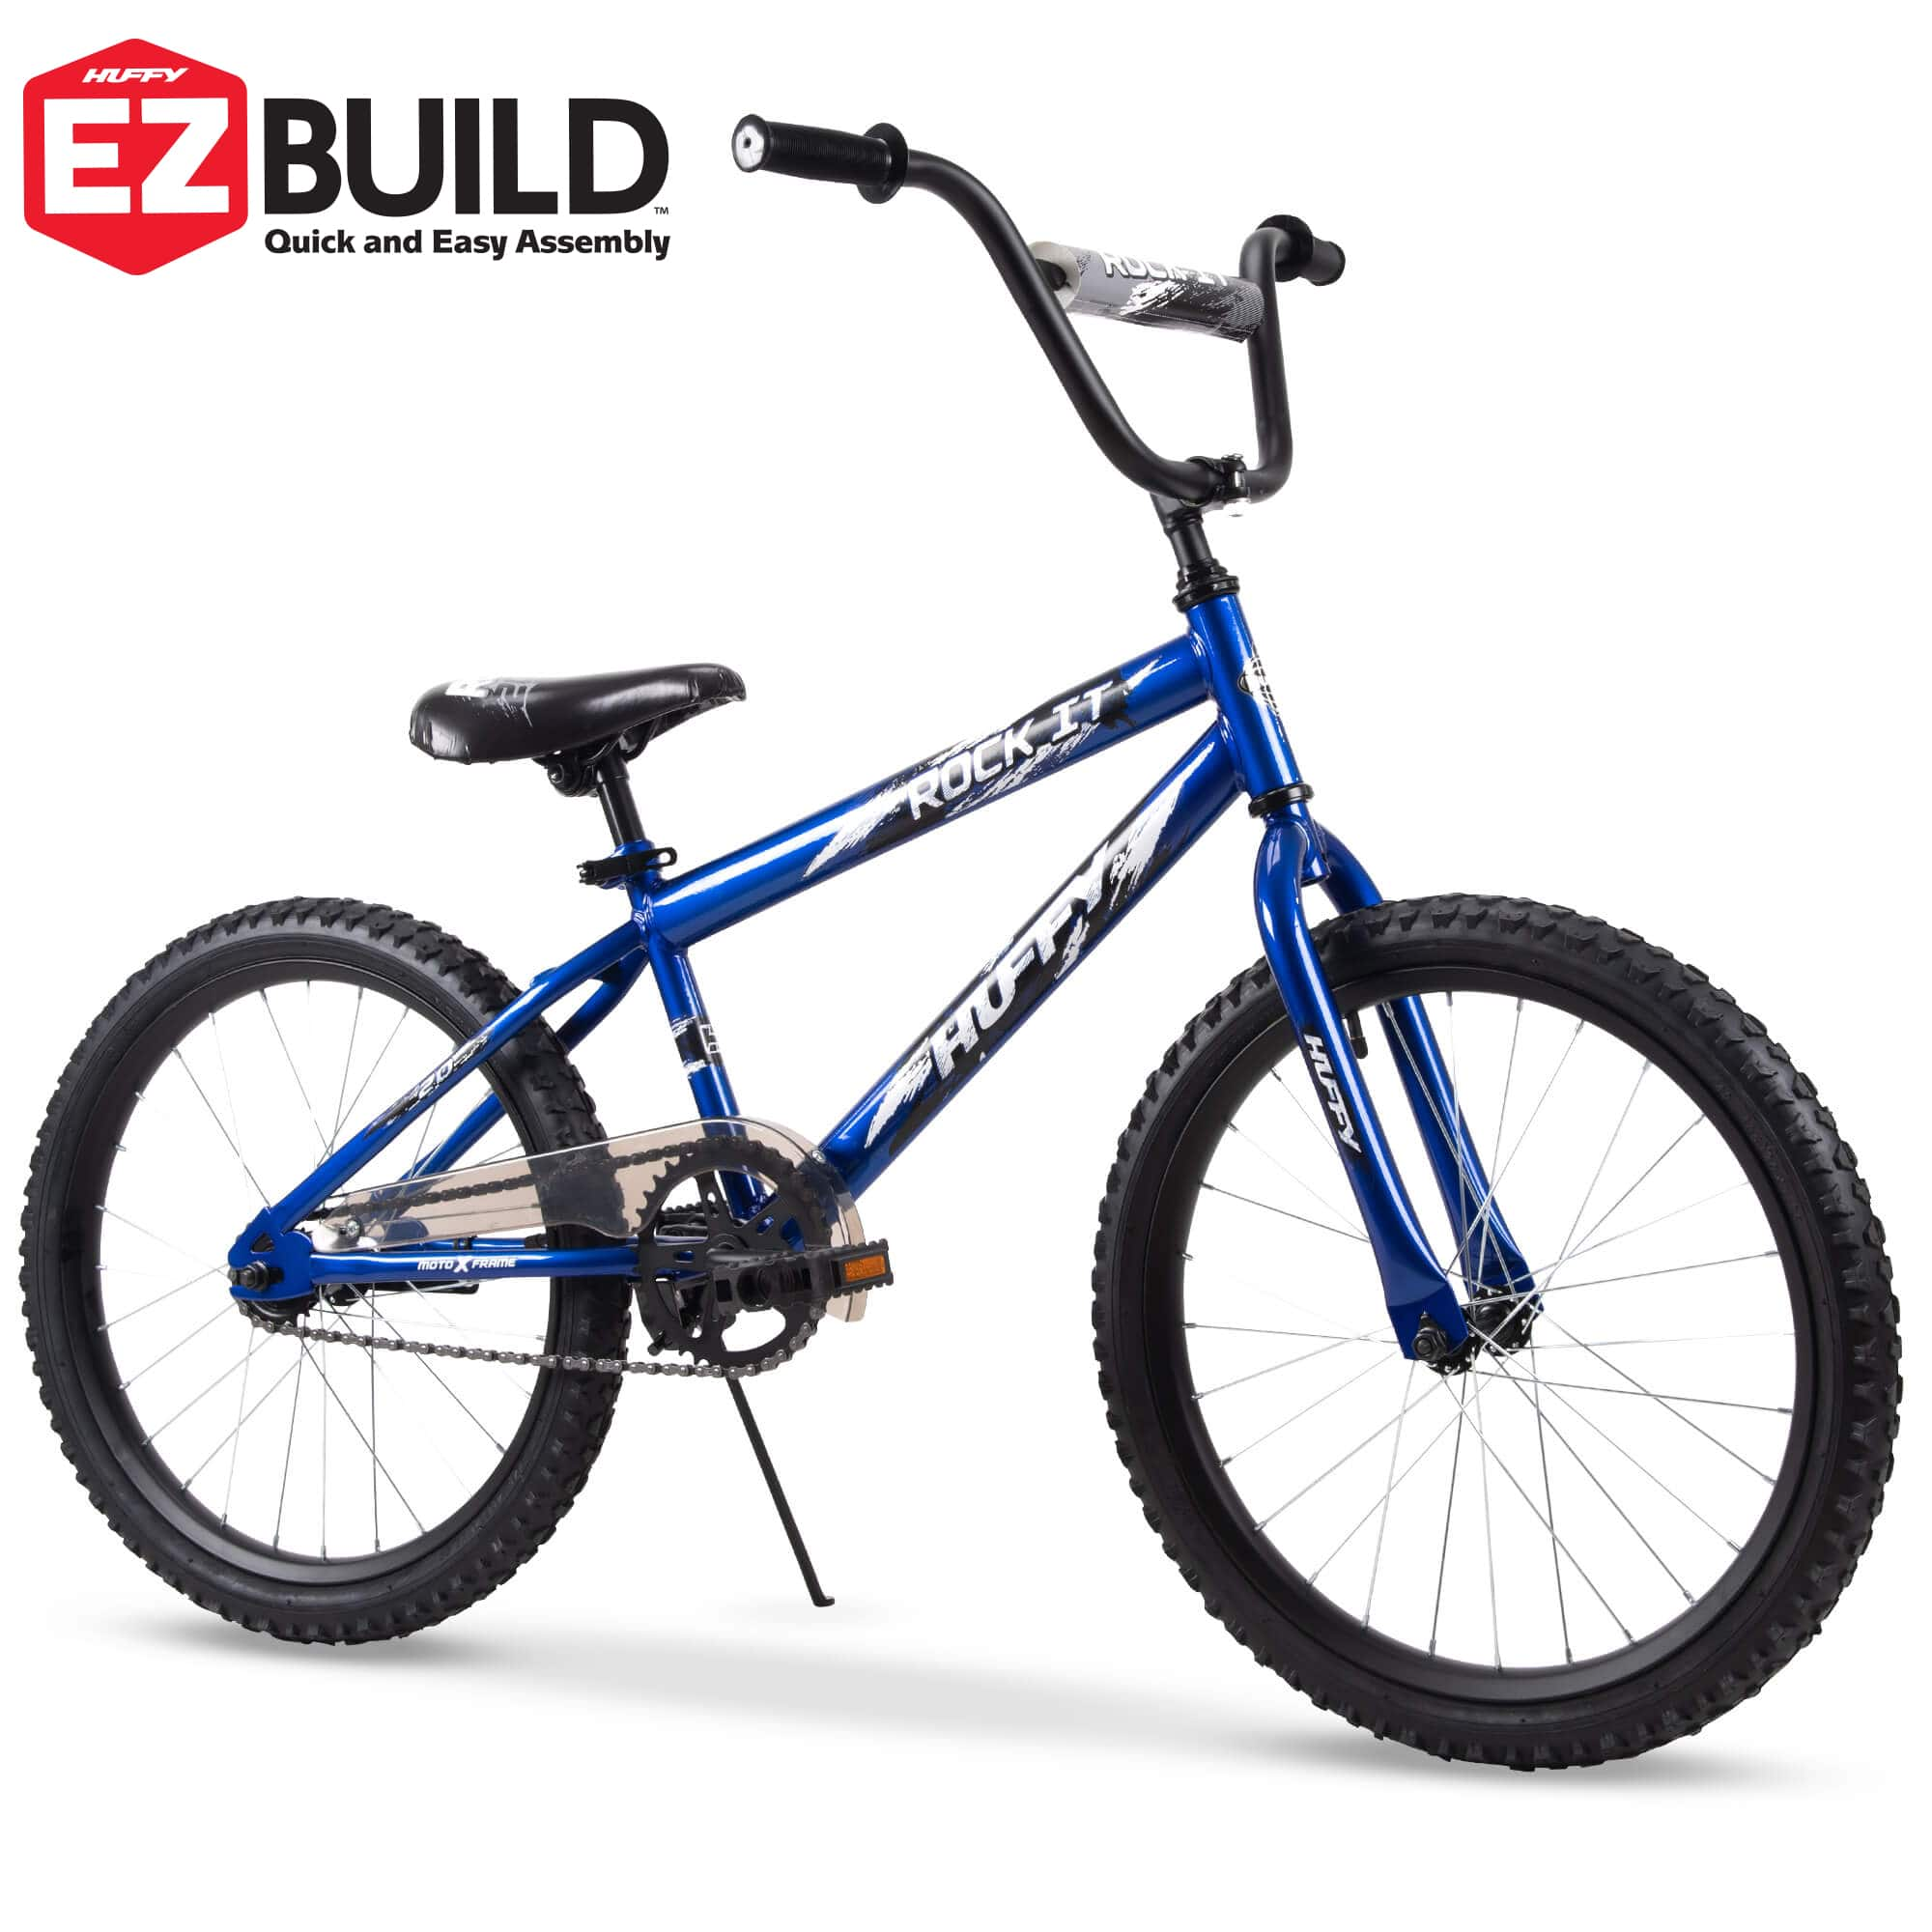 Huffy 20-Inch Rock It Boys Bike , Royal Blue Gloss - Walmart.com - Walmart.com